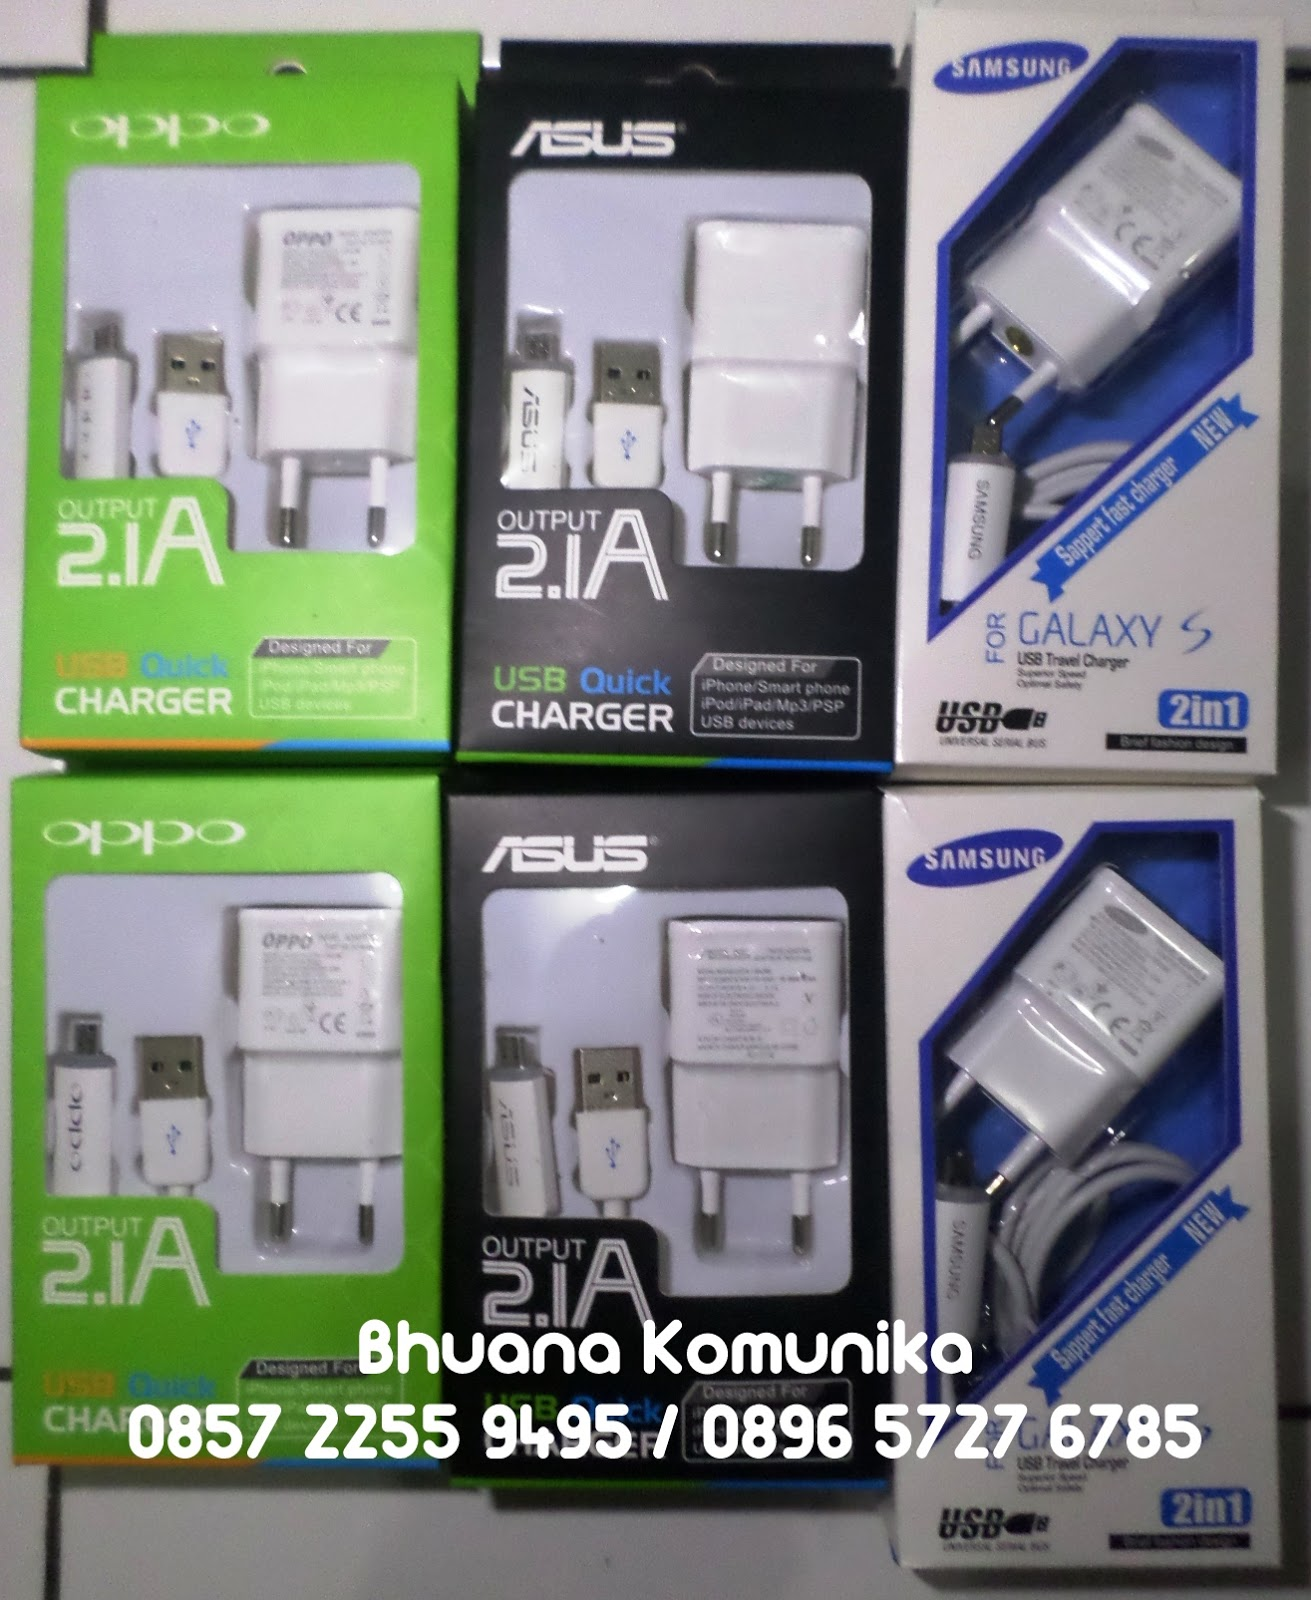 Bhuana Komunika Travel Charger Merk Asus Oppo Dan Samsung Output 21a Quick